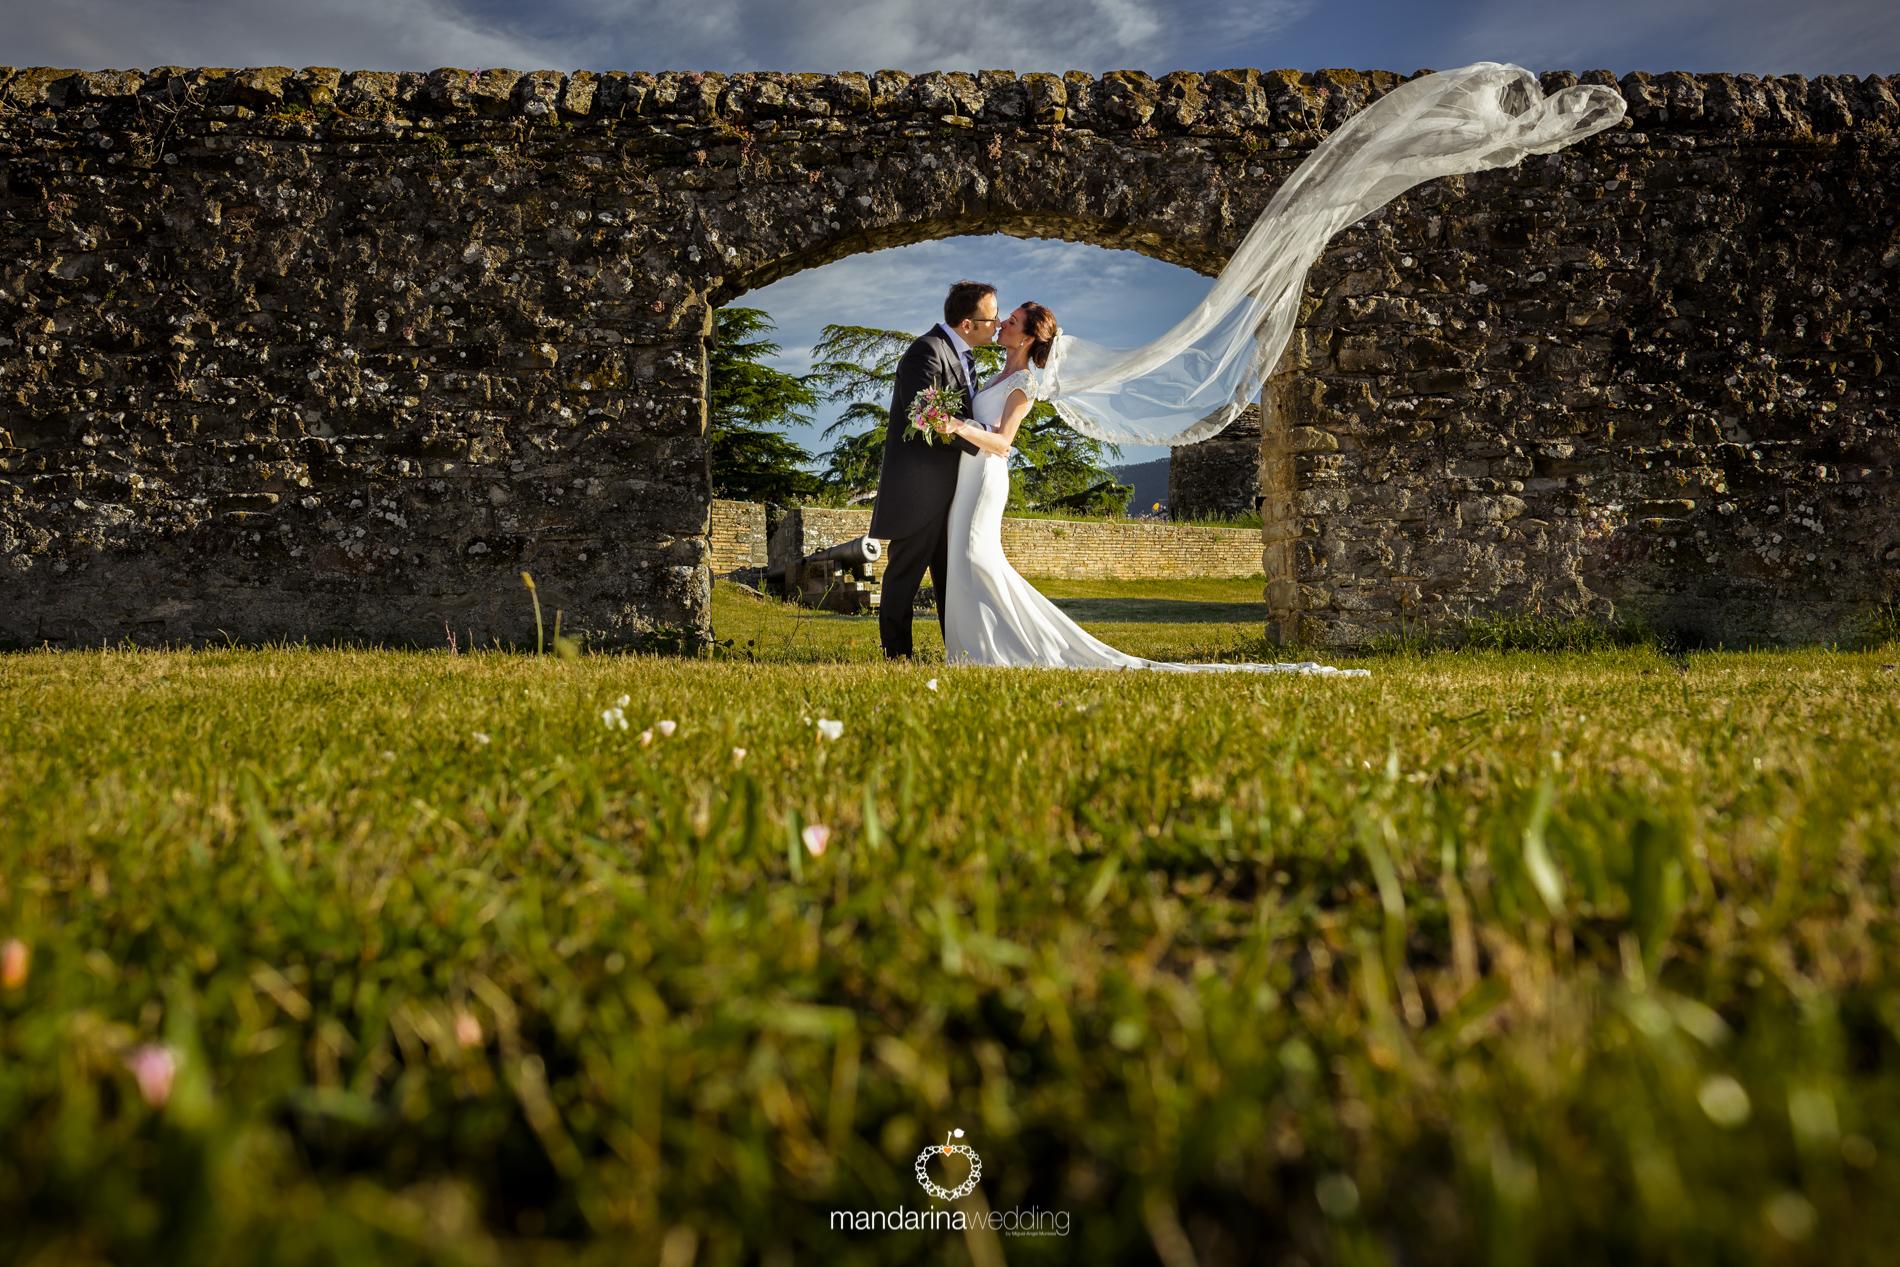 mandaria wedding, fotografos de boda, fotoperiodismo de boda, mejores fotografos de boda, bodas soria, bodas pirineo, bodas Madrid, fotógrafos tarragona_36